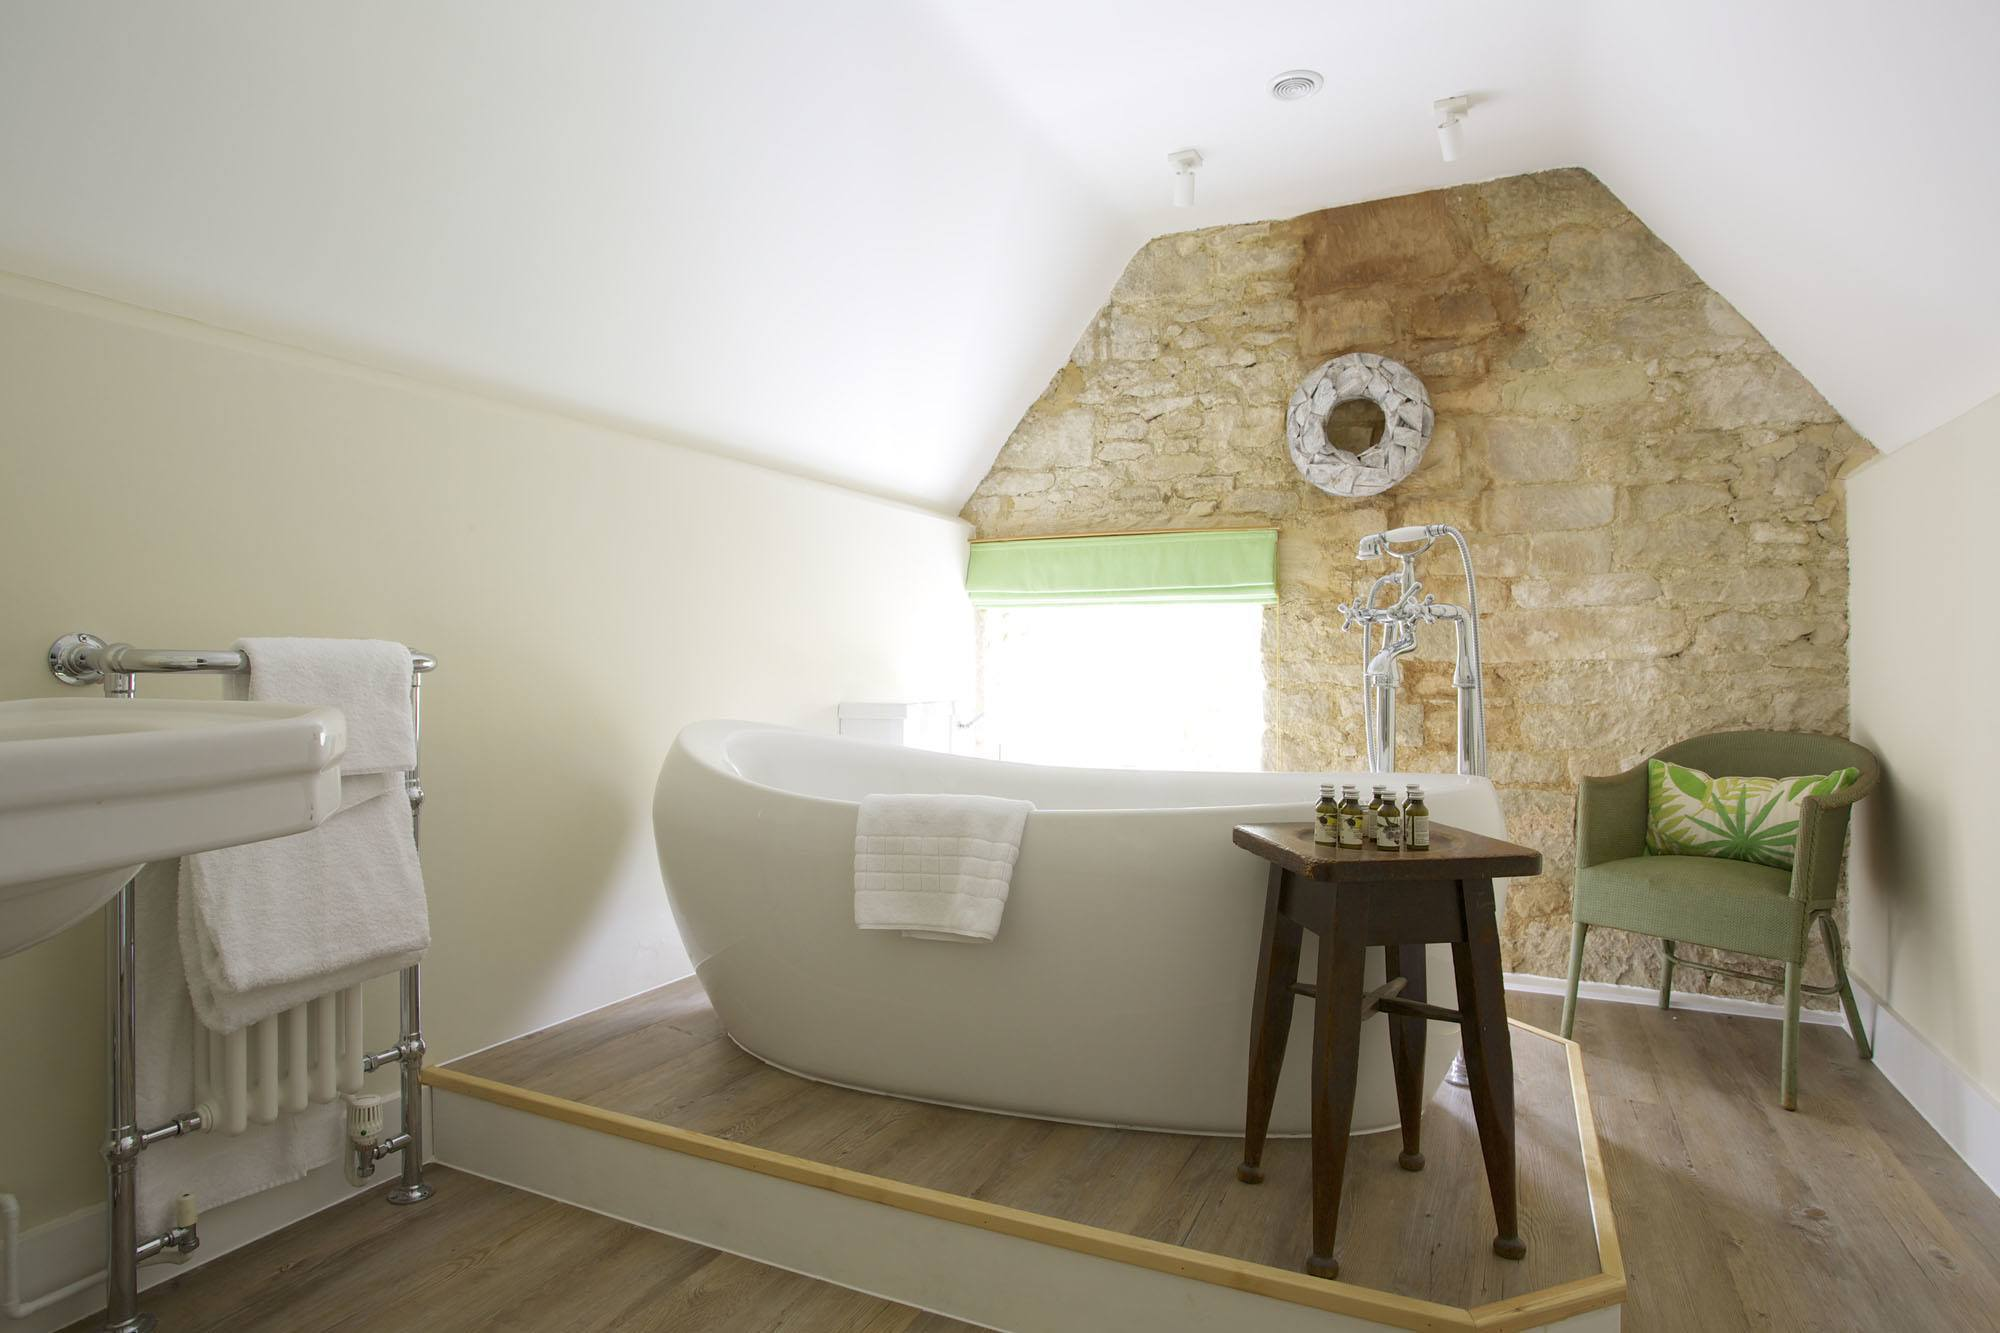 ashcombe wide bath JKE_4362.jpg